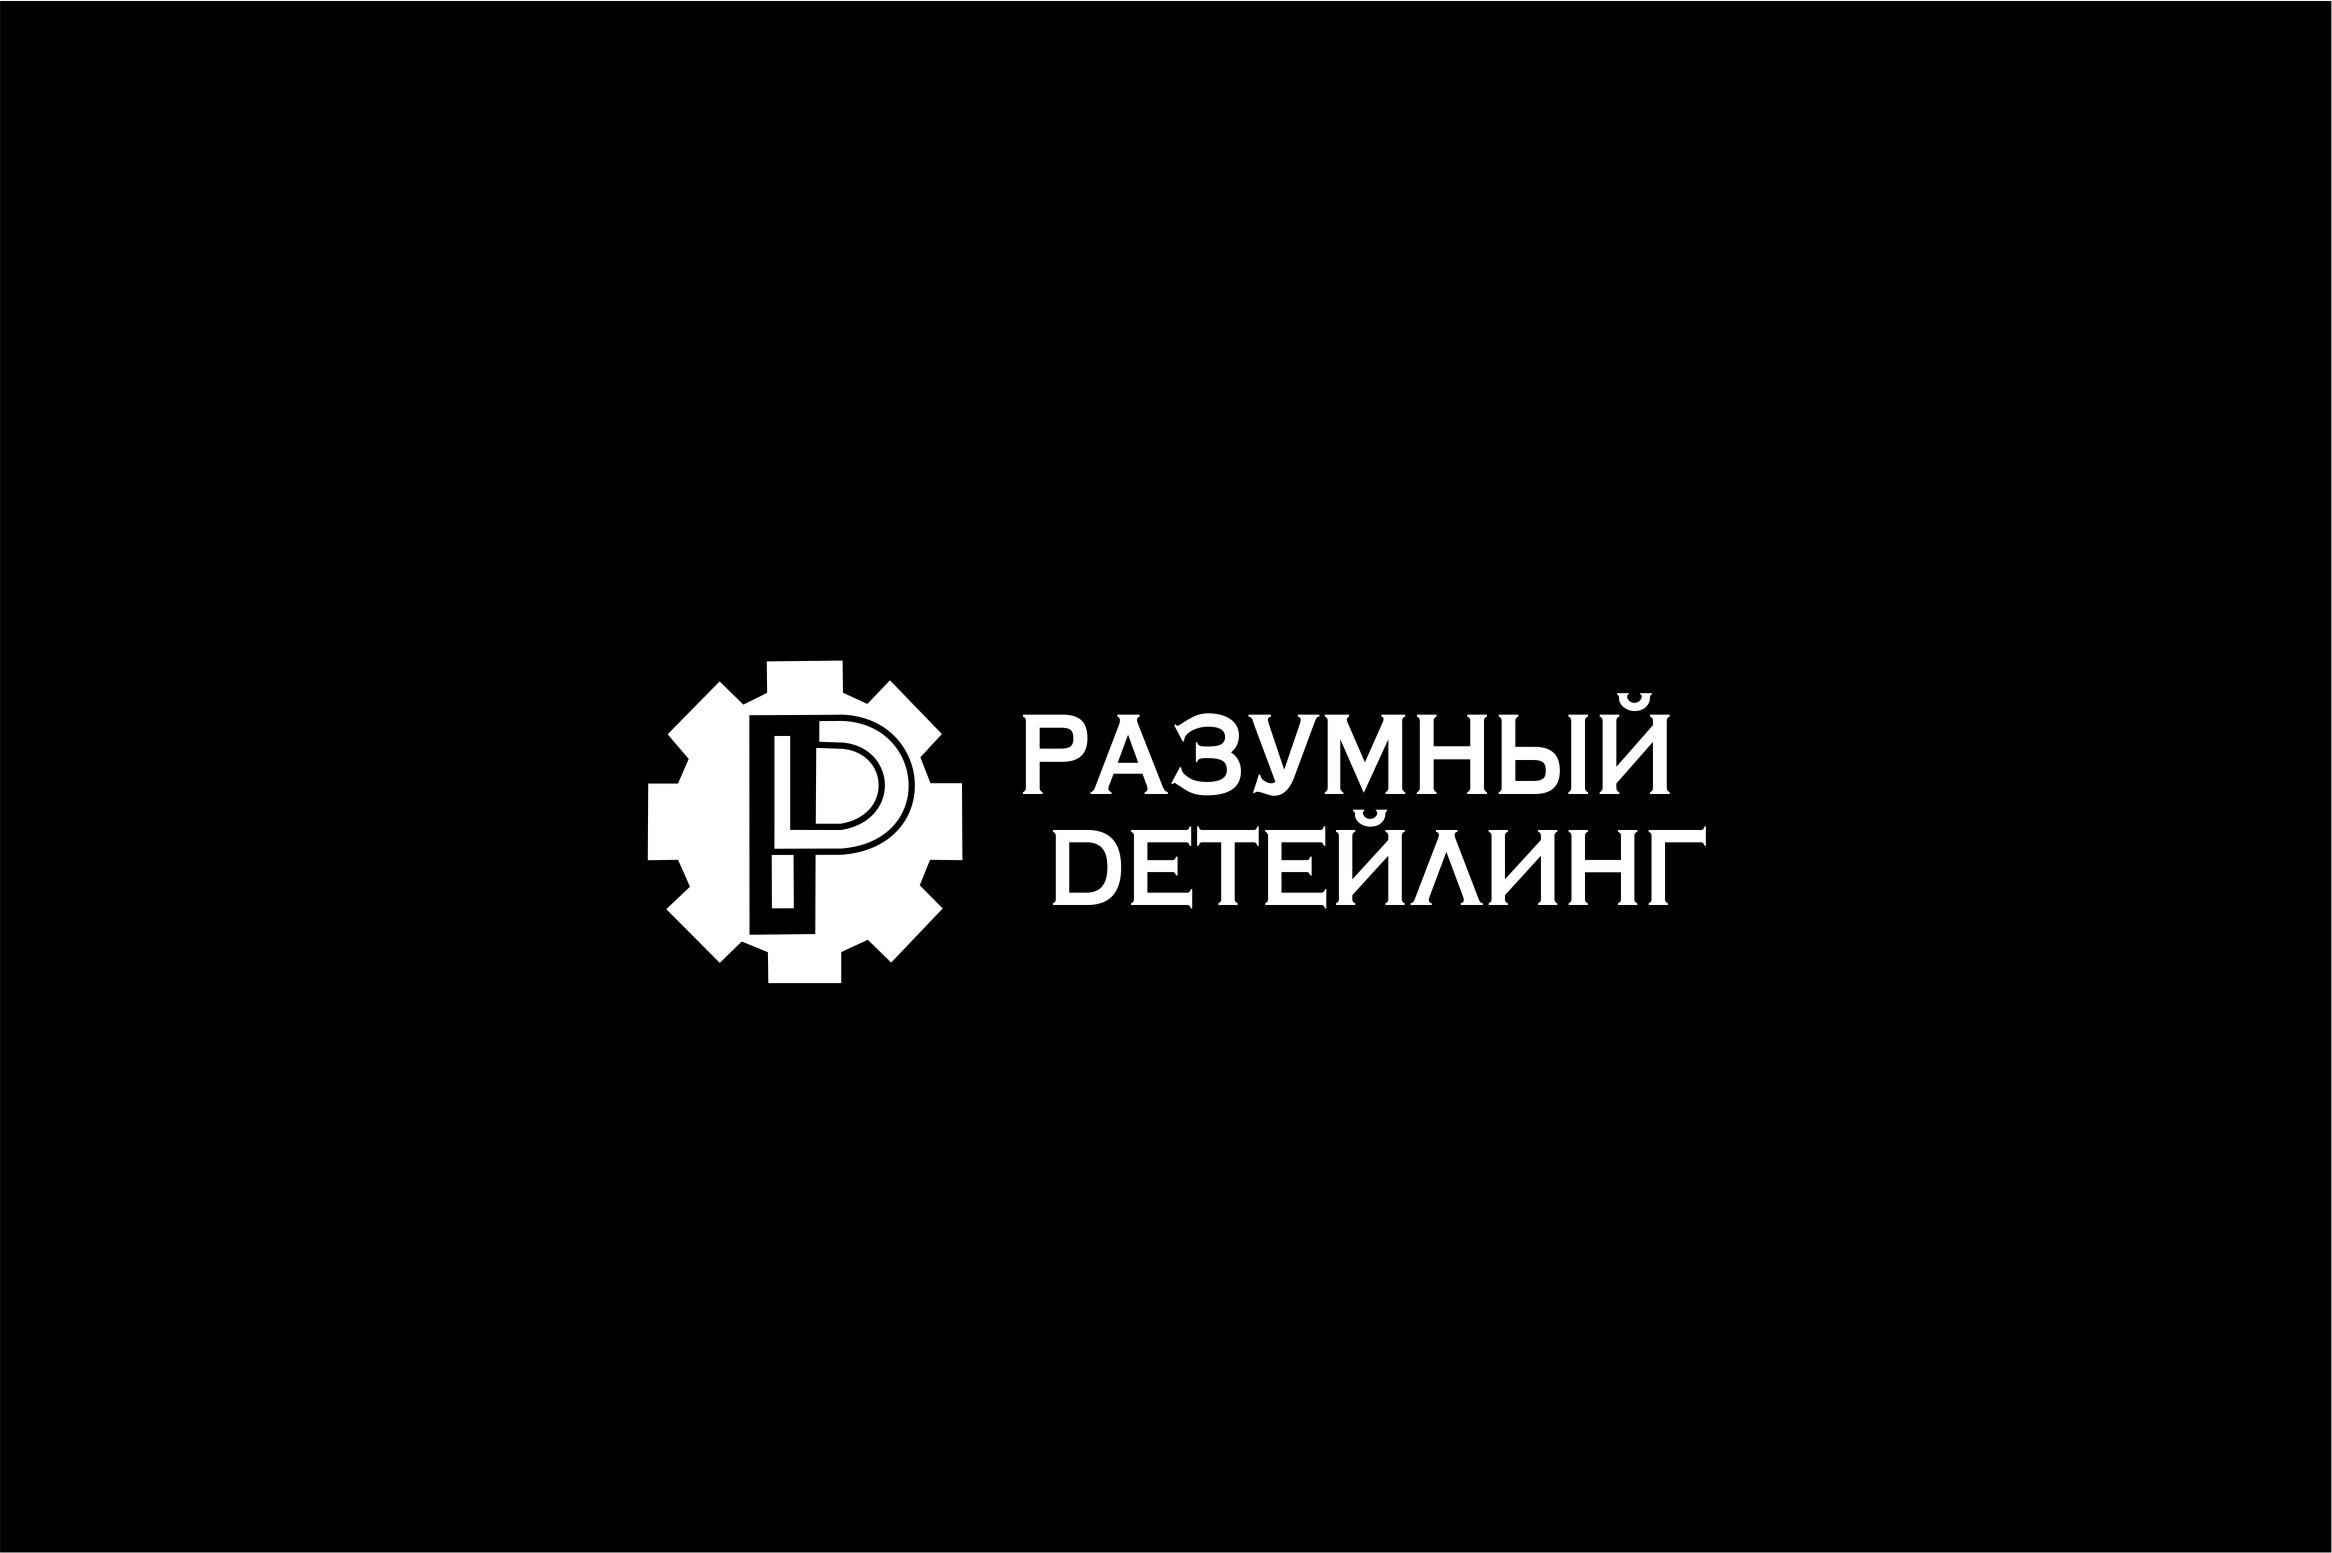 Ребрендинг логотипа  фото f_1945ae31c1f253d1.jpg